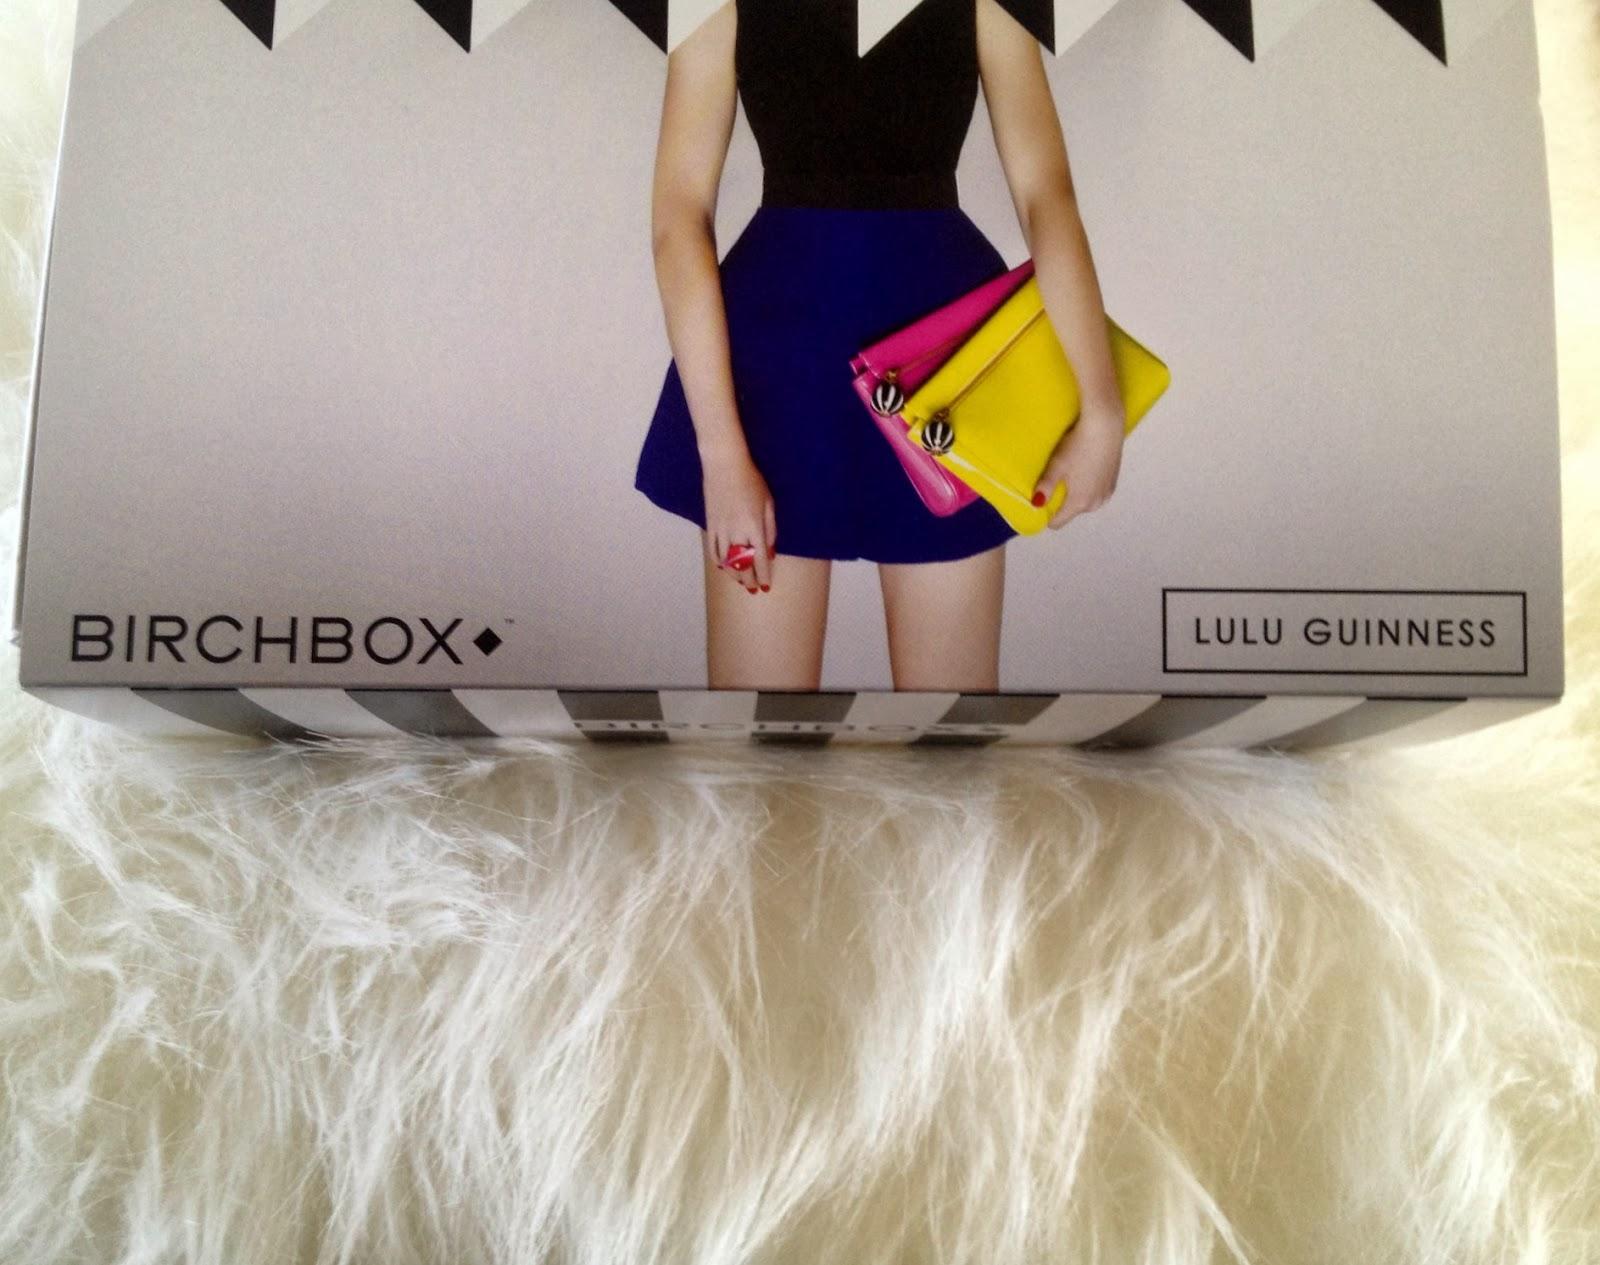 Birchbox LuLu Guiness edition